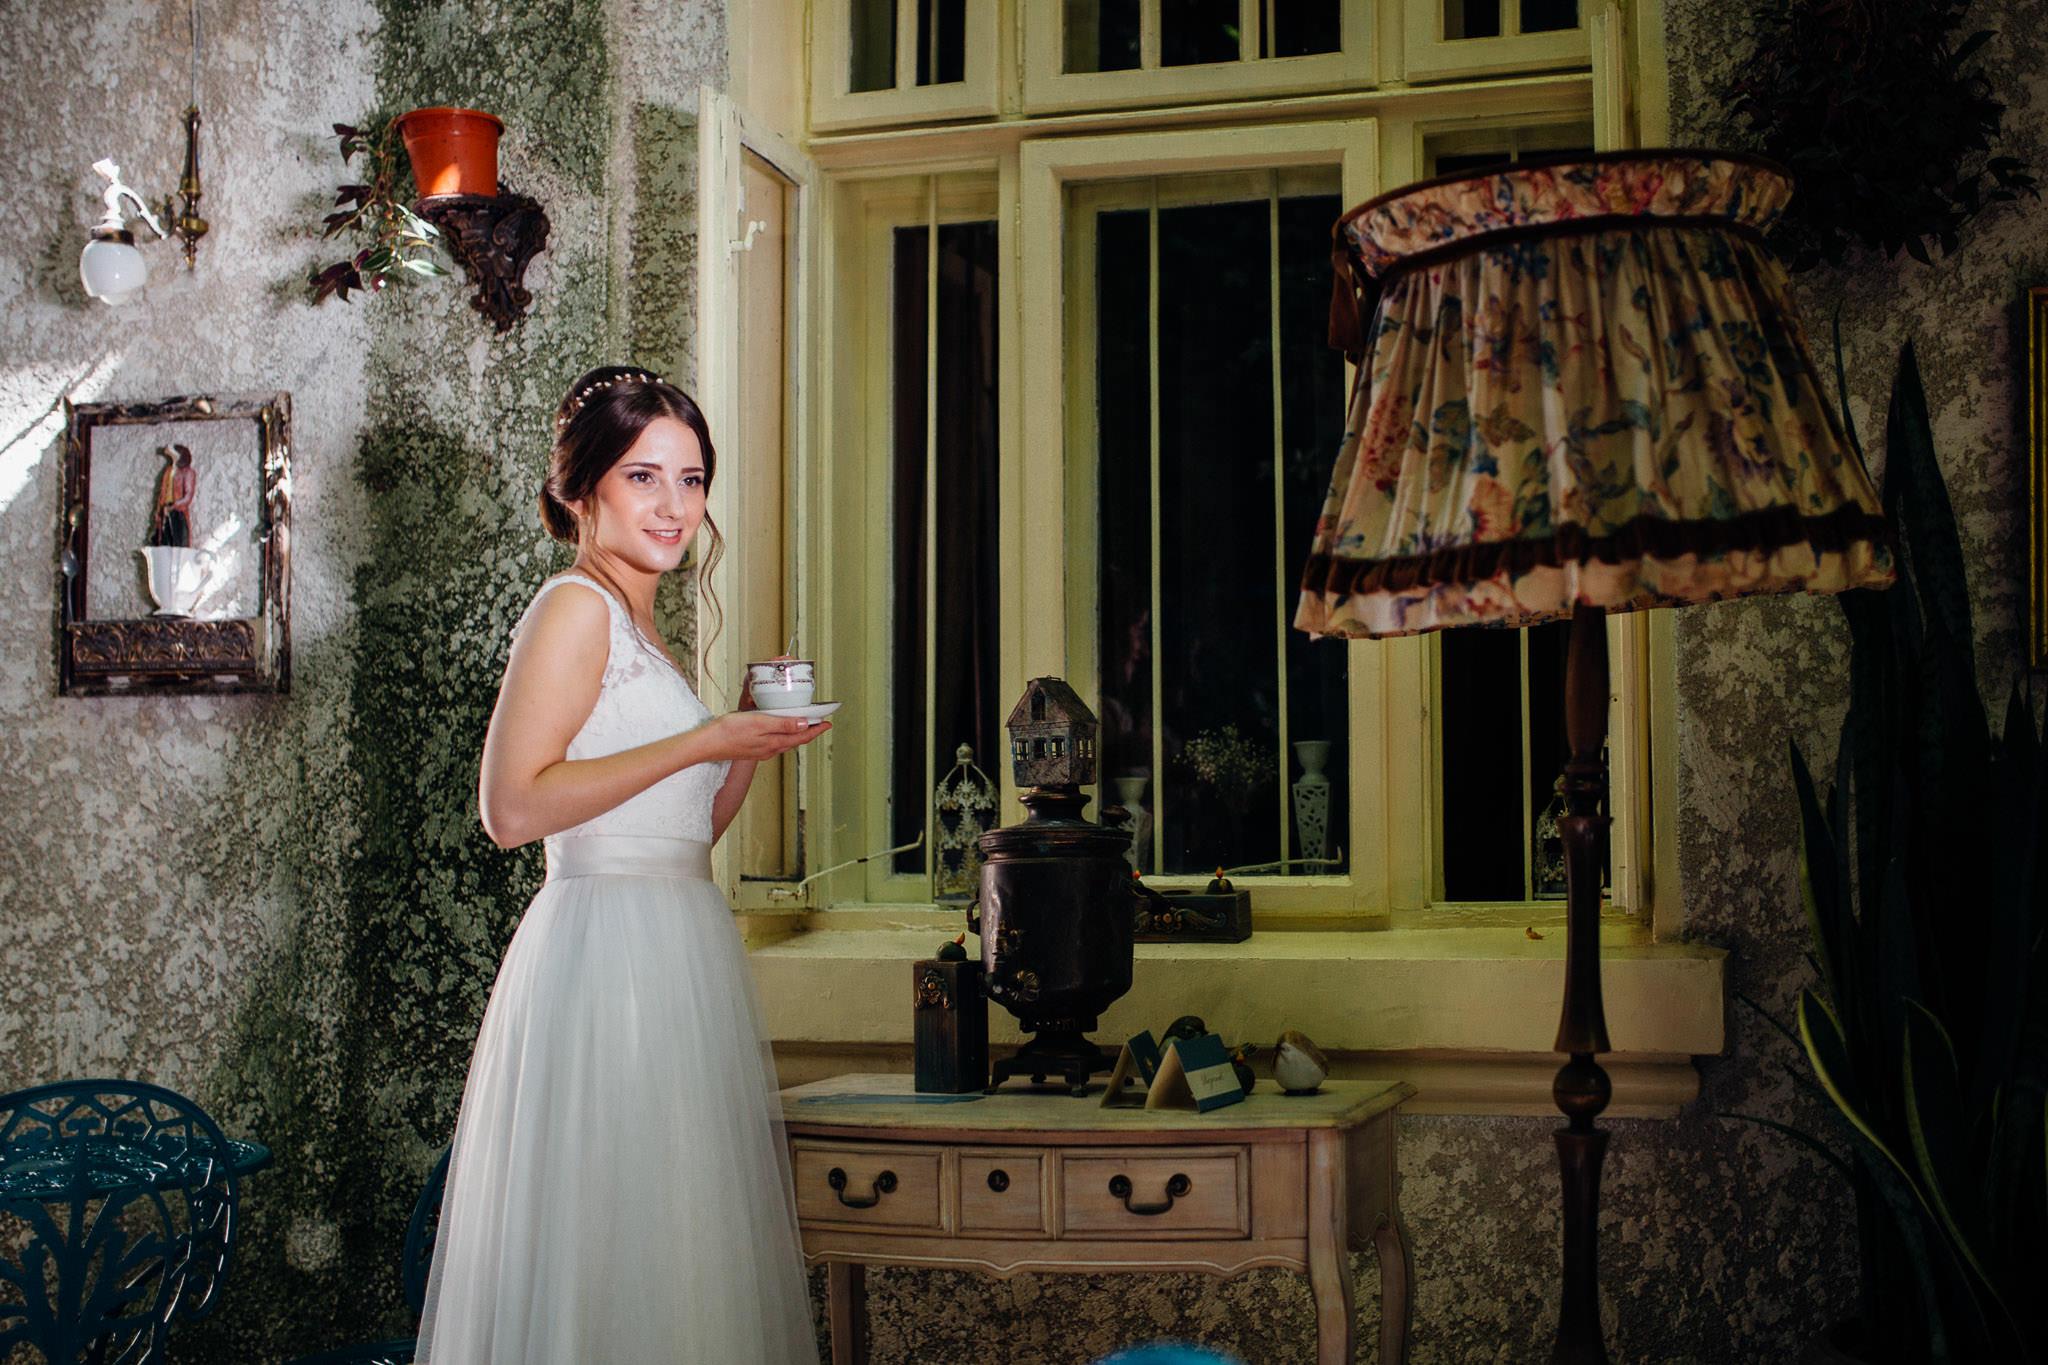 Beniamin & Ana fotograf nunta vintage Bucuresti-1069